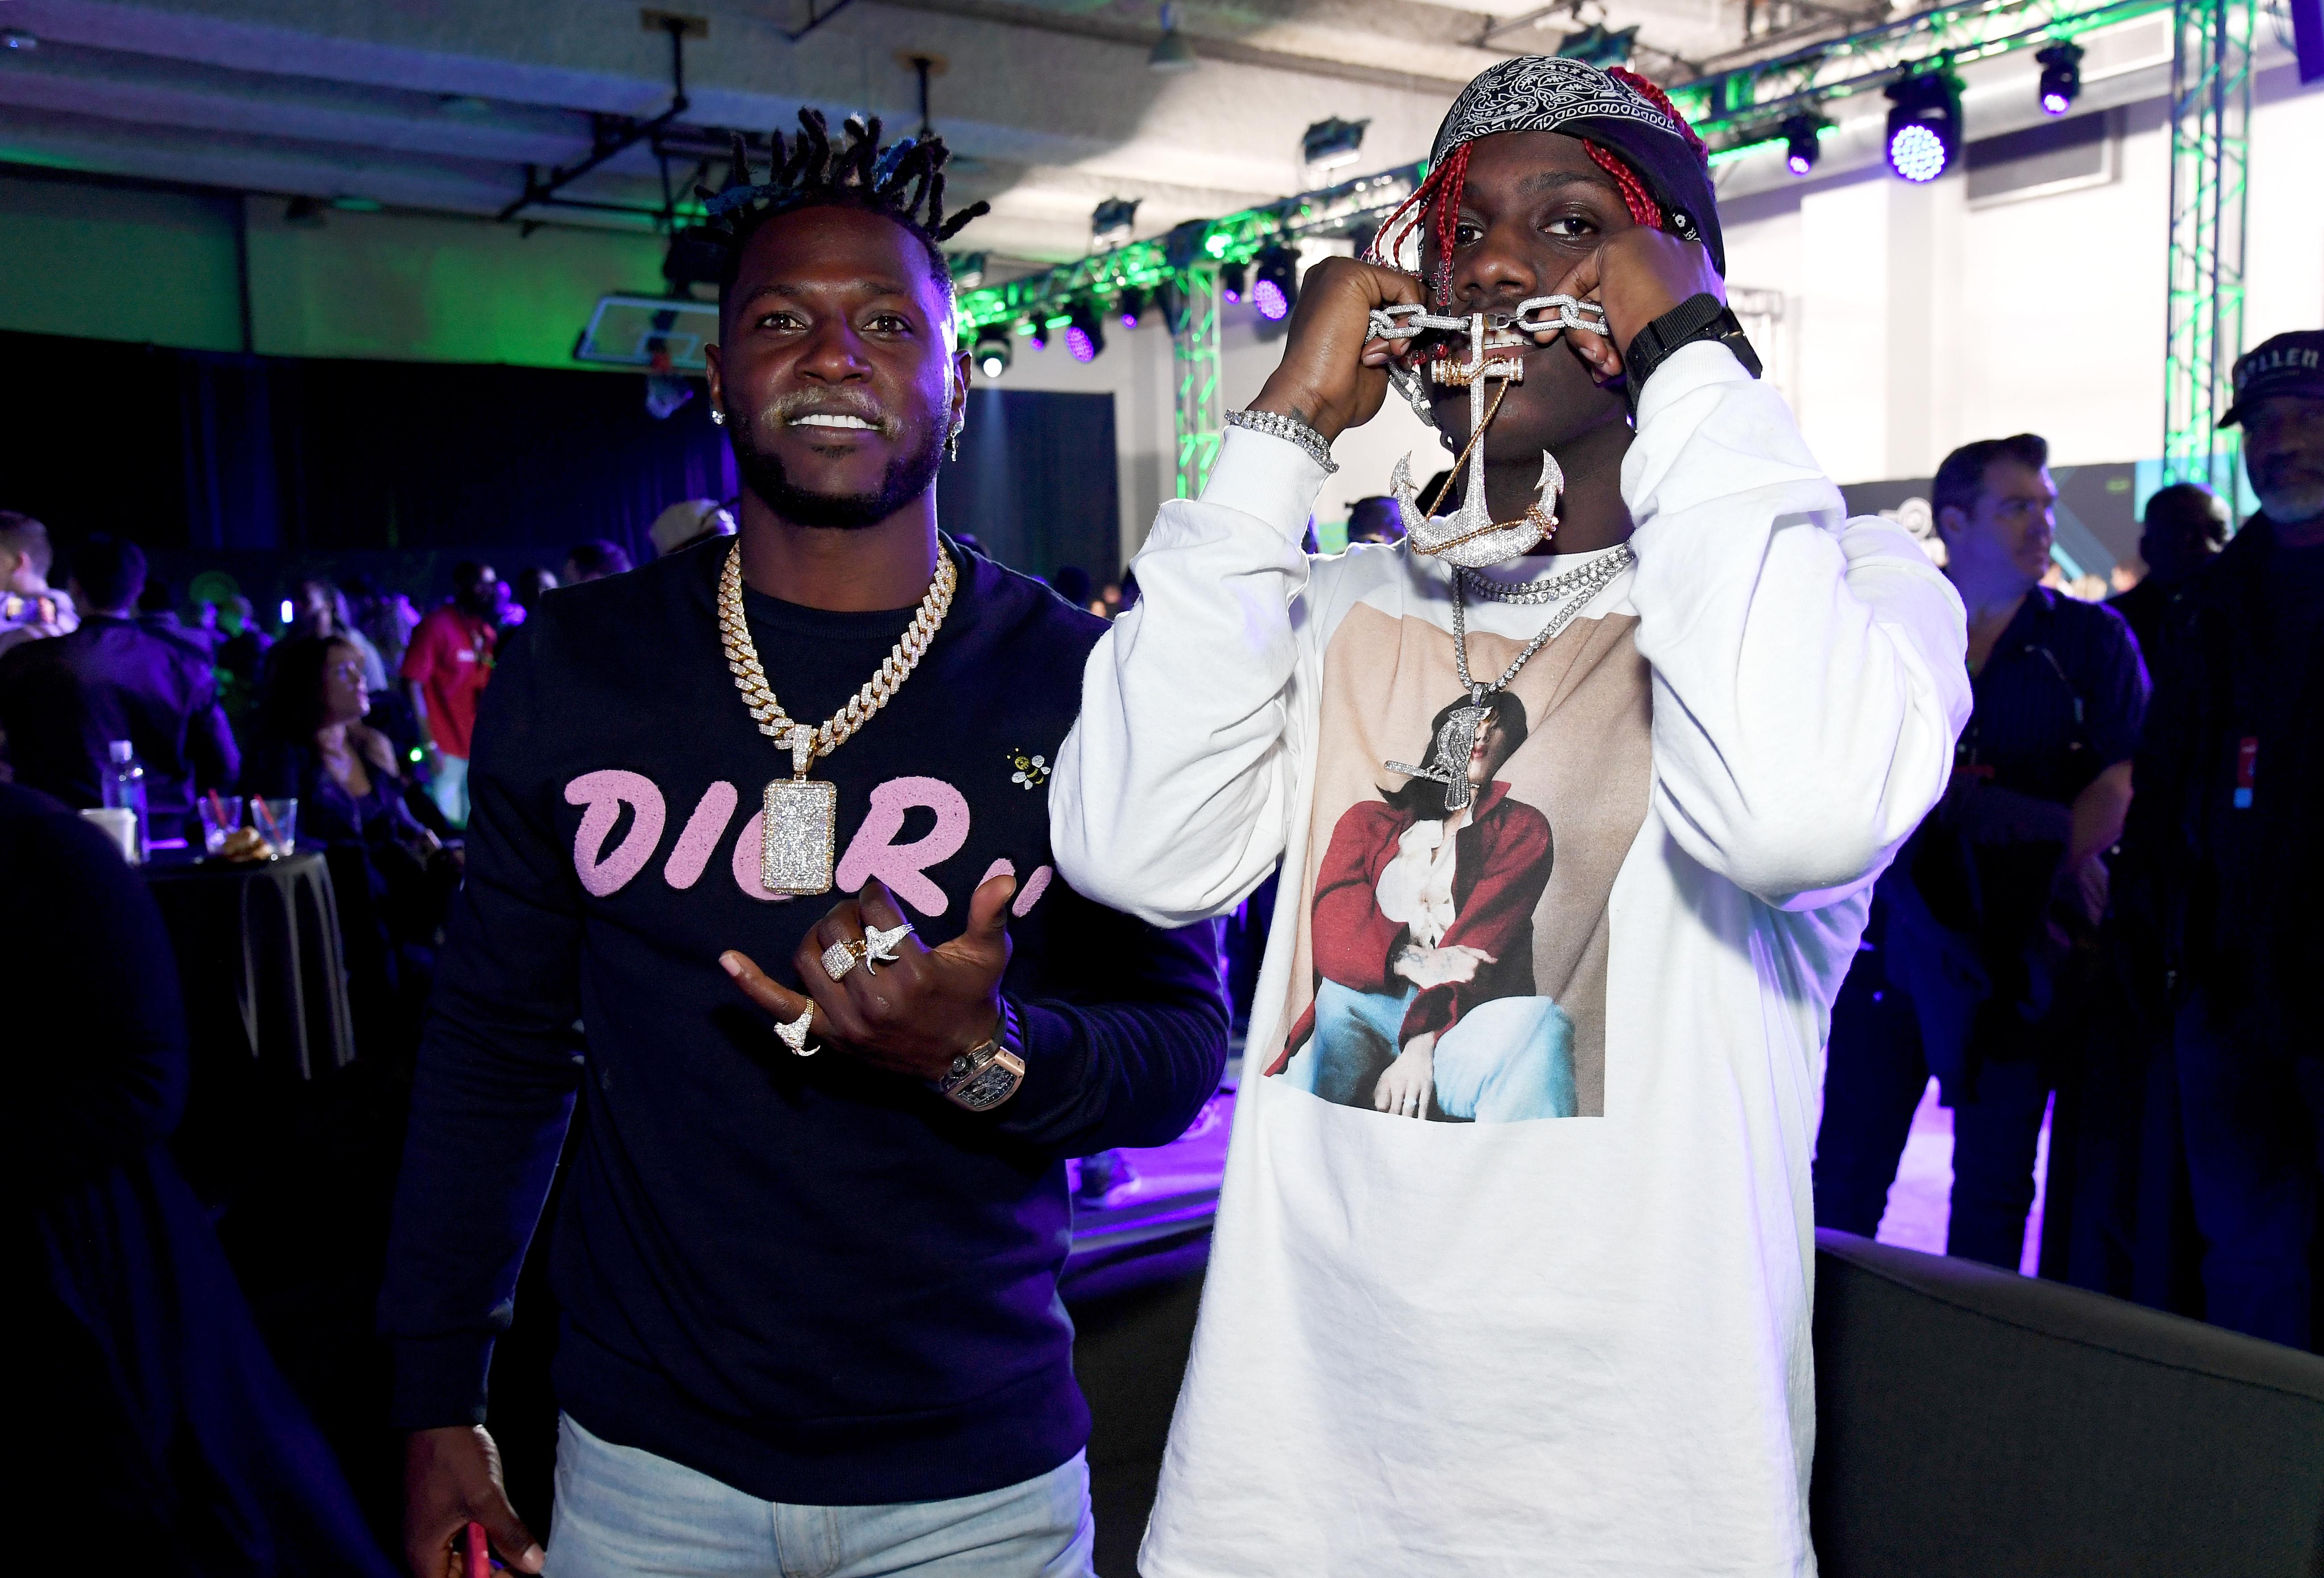 Antonio Brown, Lil Yachty 2019 Bud Light Super Bowl Fest/ EA Sports Bowl